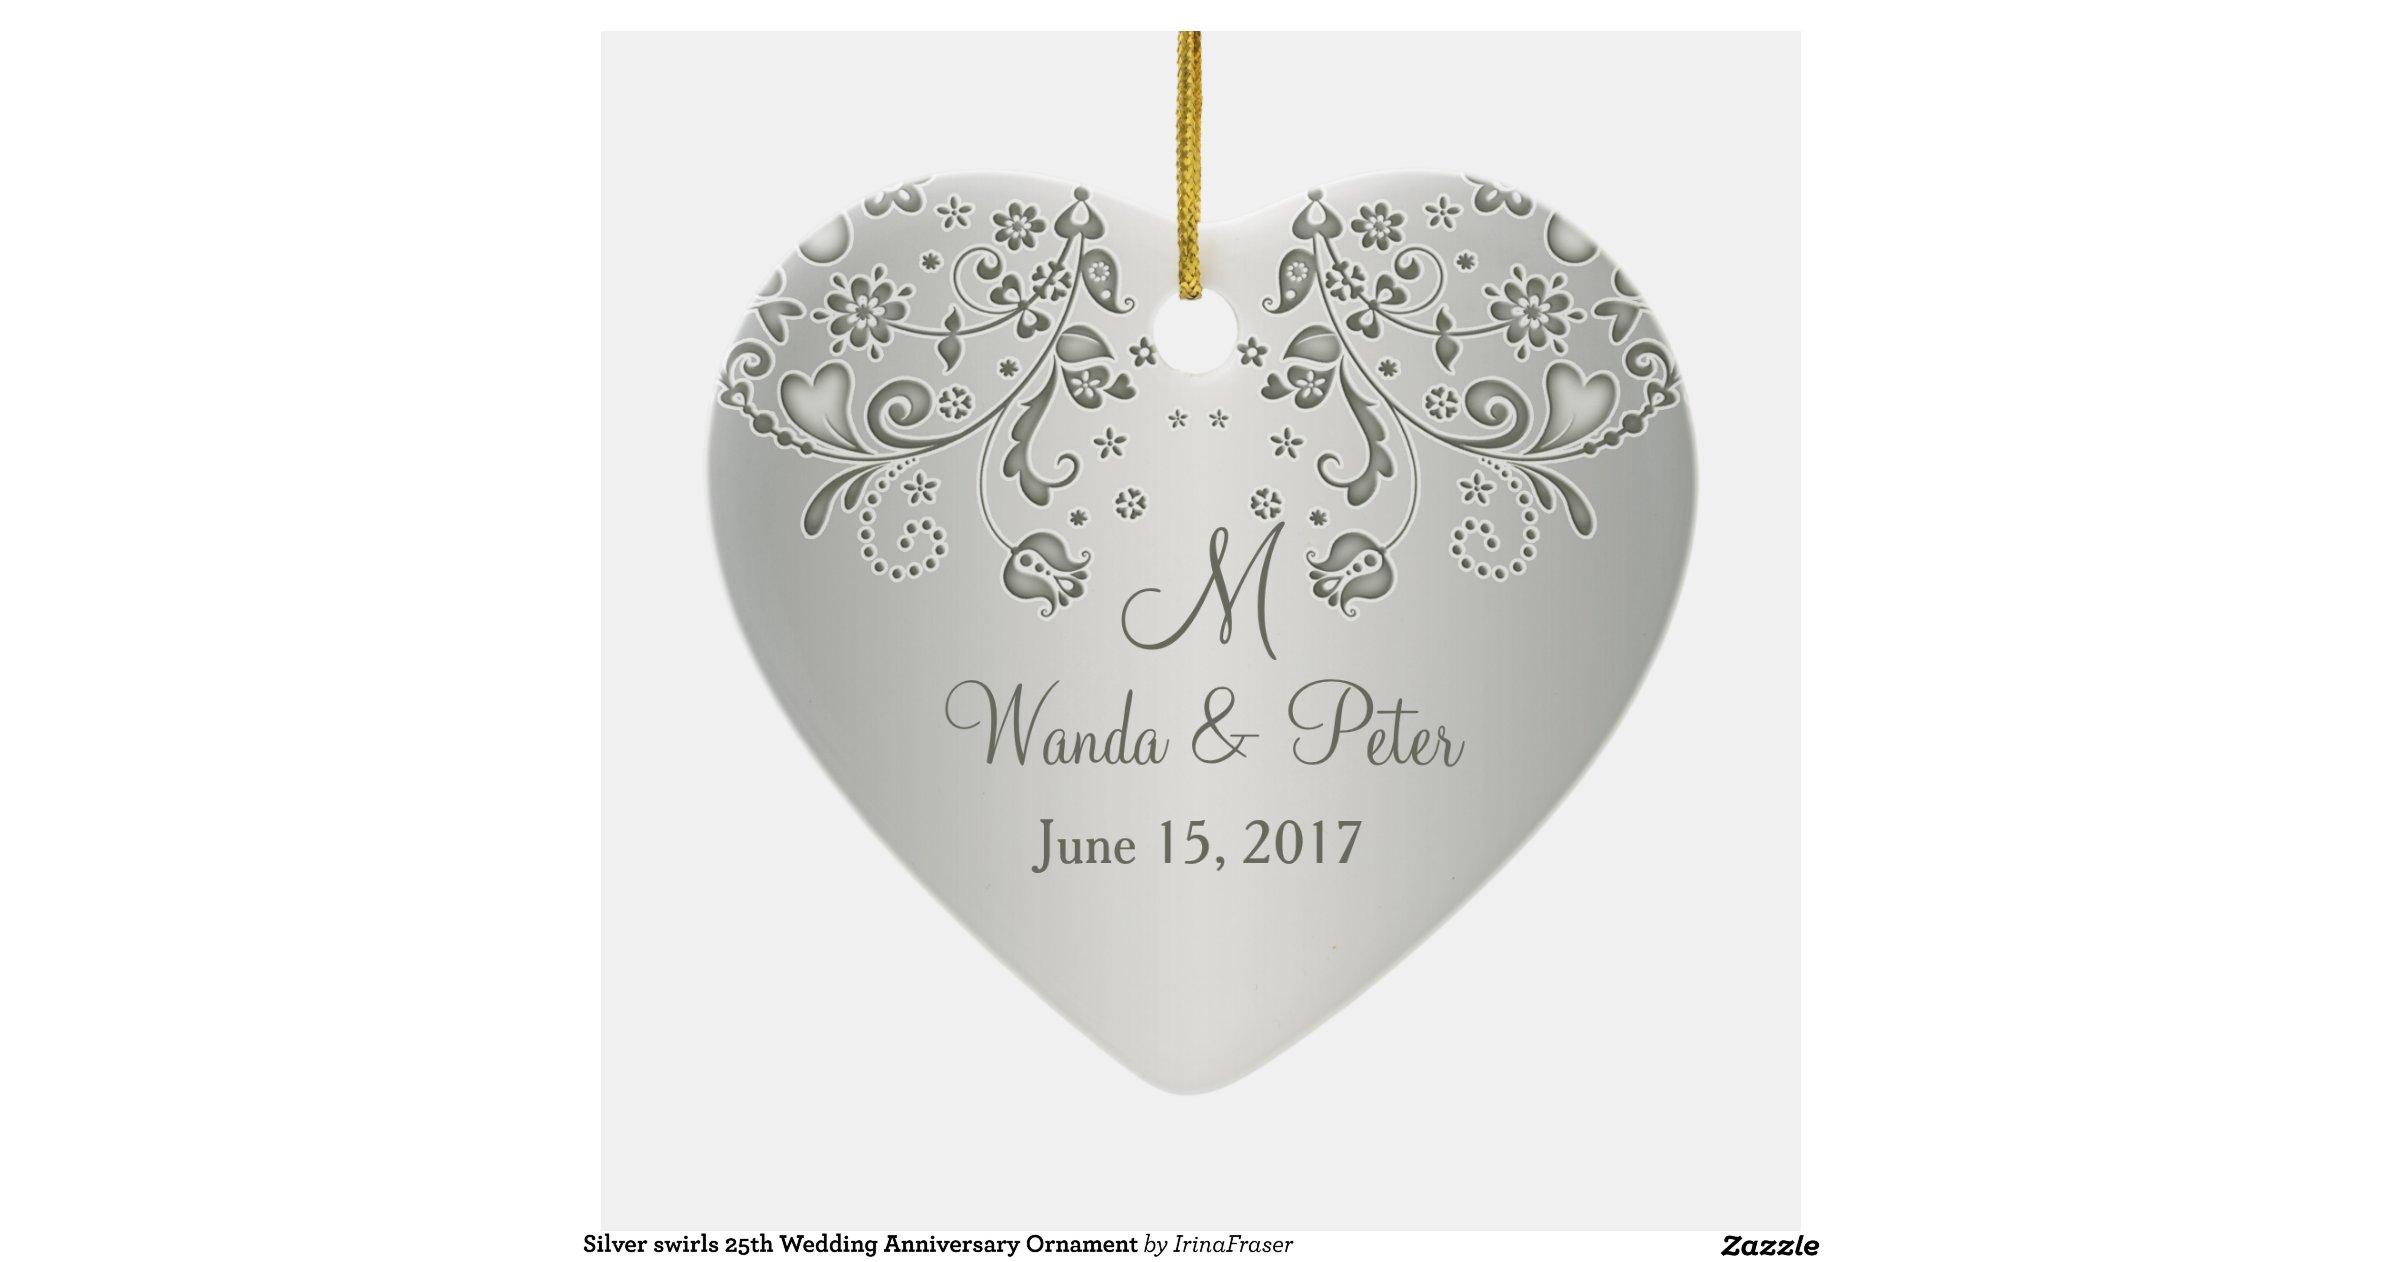 Silver Swirls 25th Wedding Anniversary Ornament R15c27c2749e64120be88ca8dfaf7